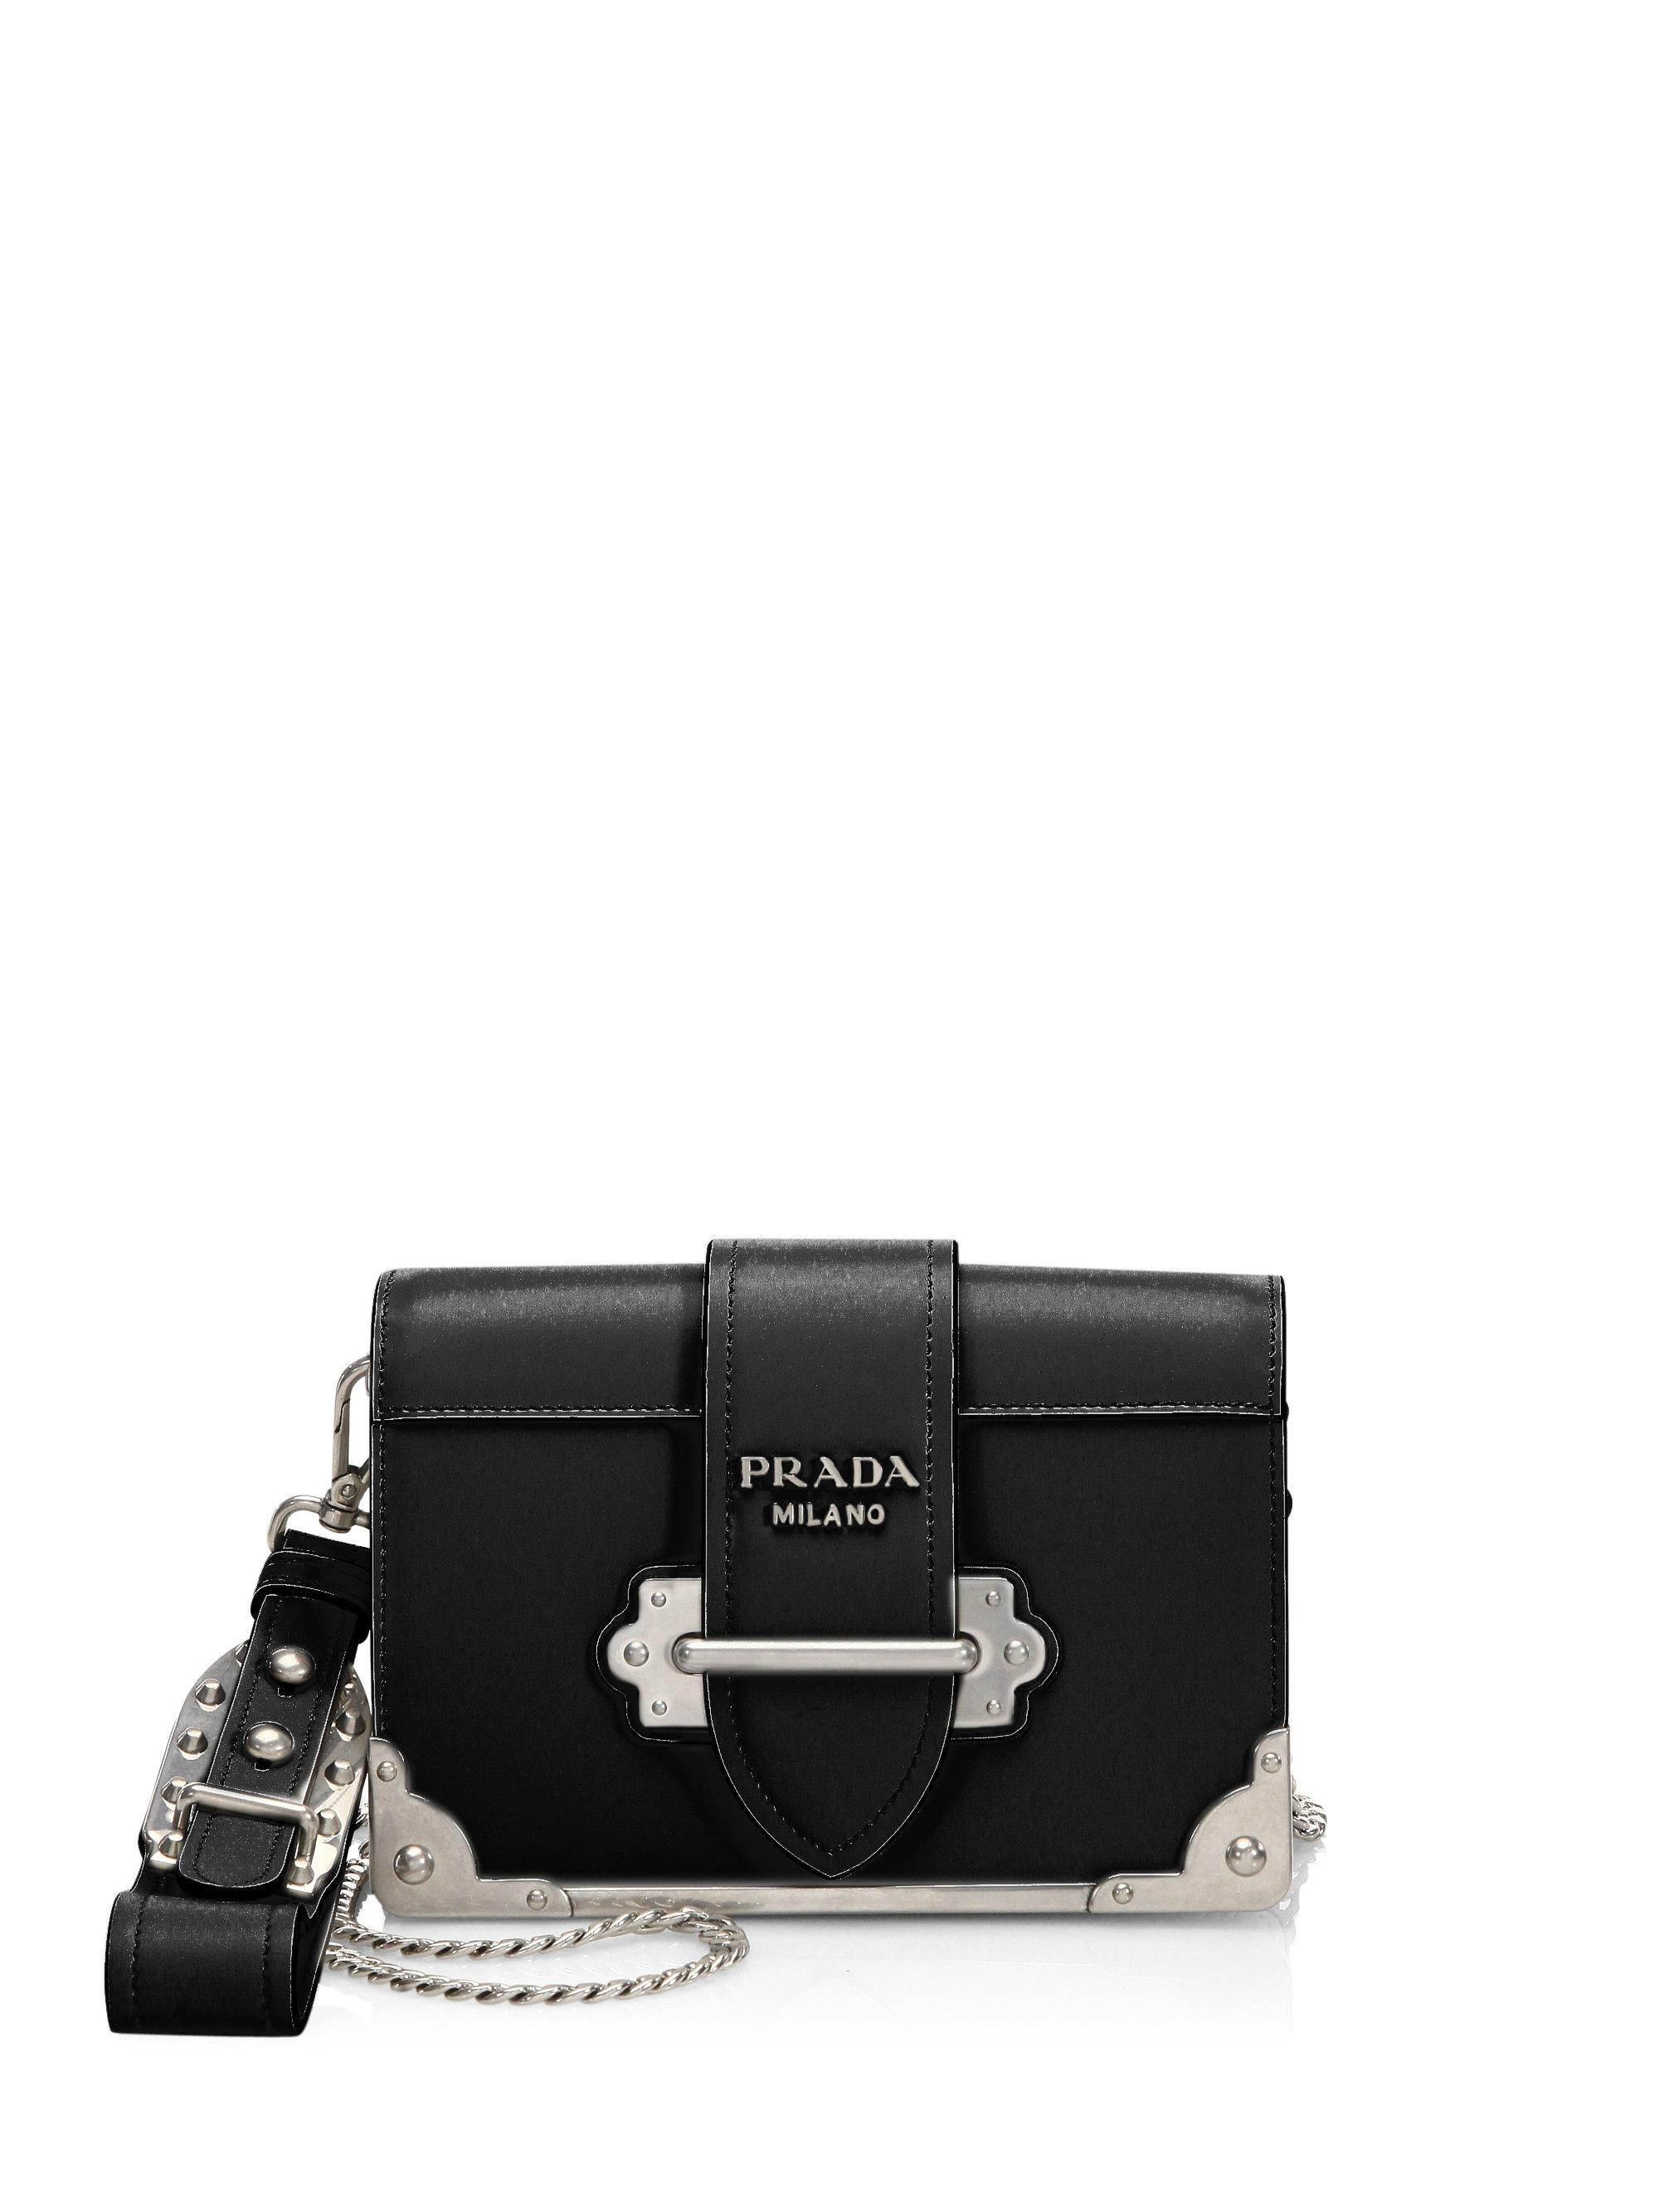 29122f61237126 Prada Wristlet Chain Cahier in Black - Lyst